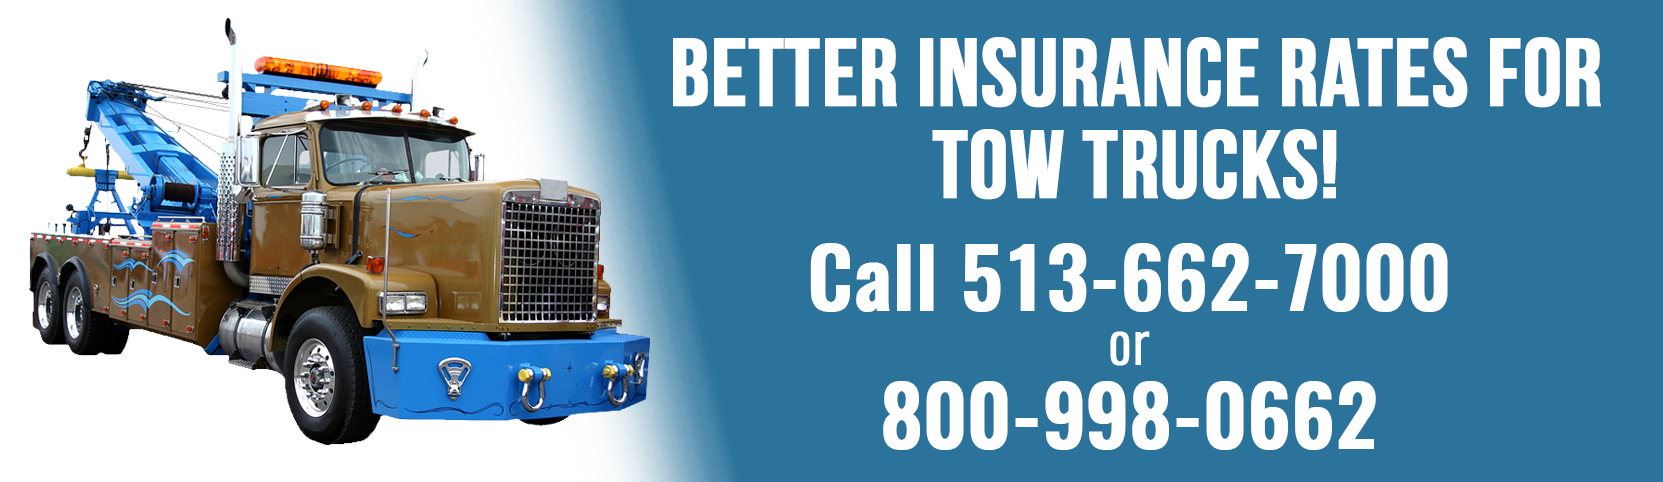 Columbus Tow Truck Insurance